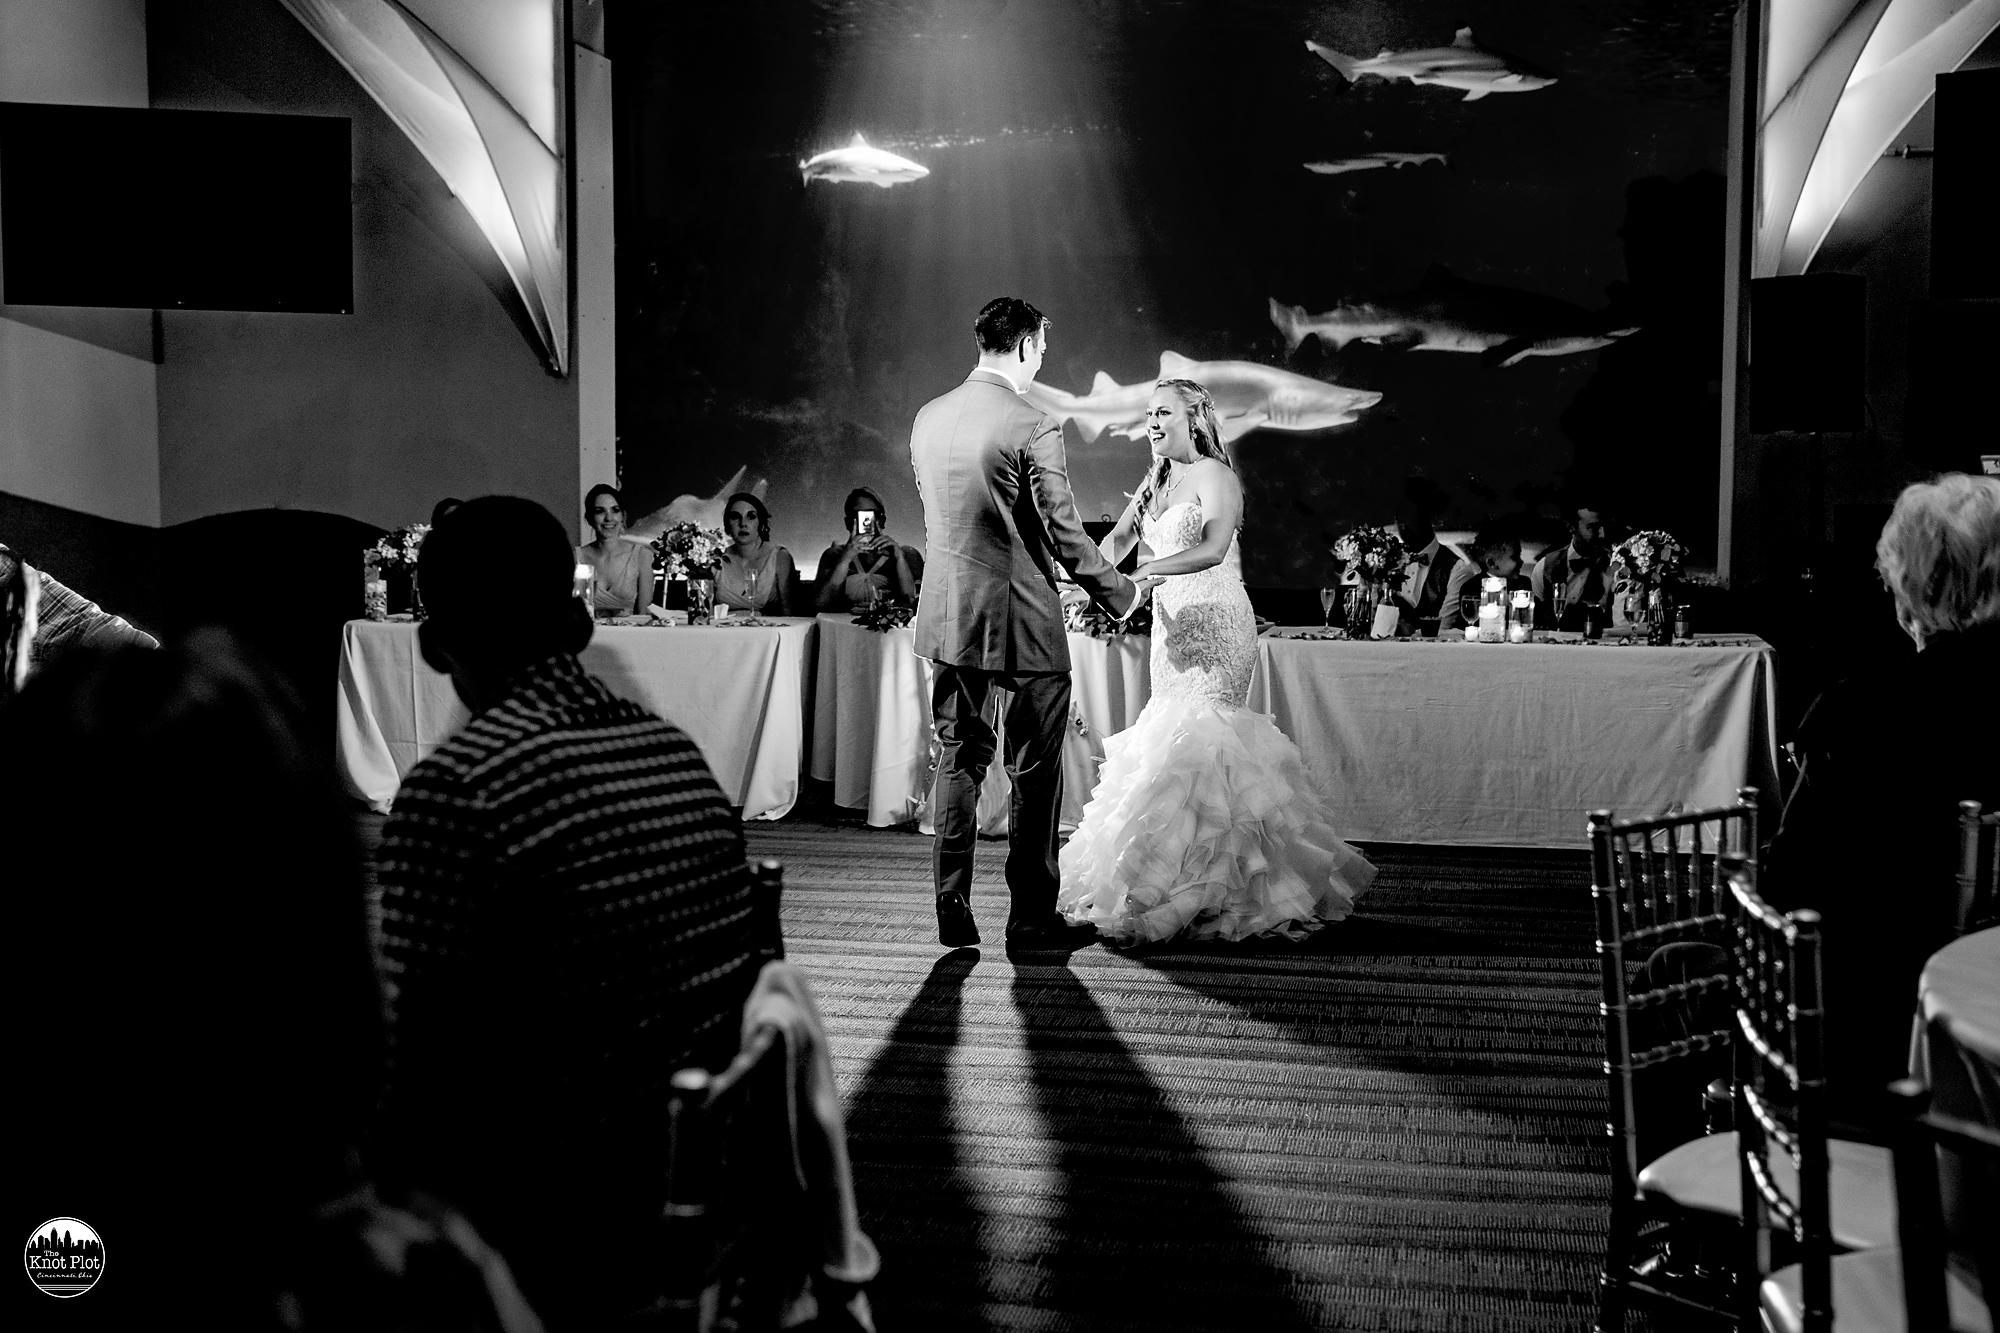 Newport-Aquarium-Wedding-Photos-21.jpg